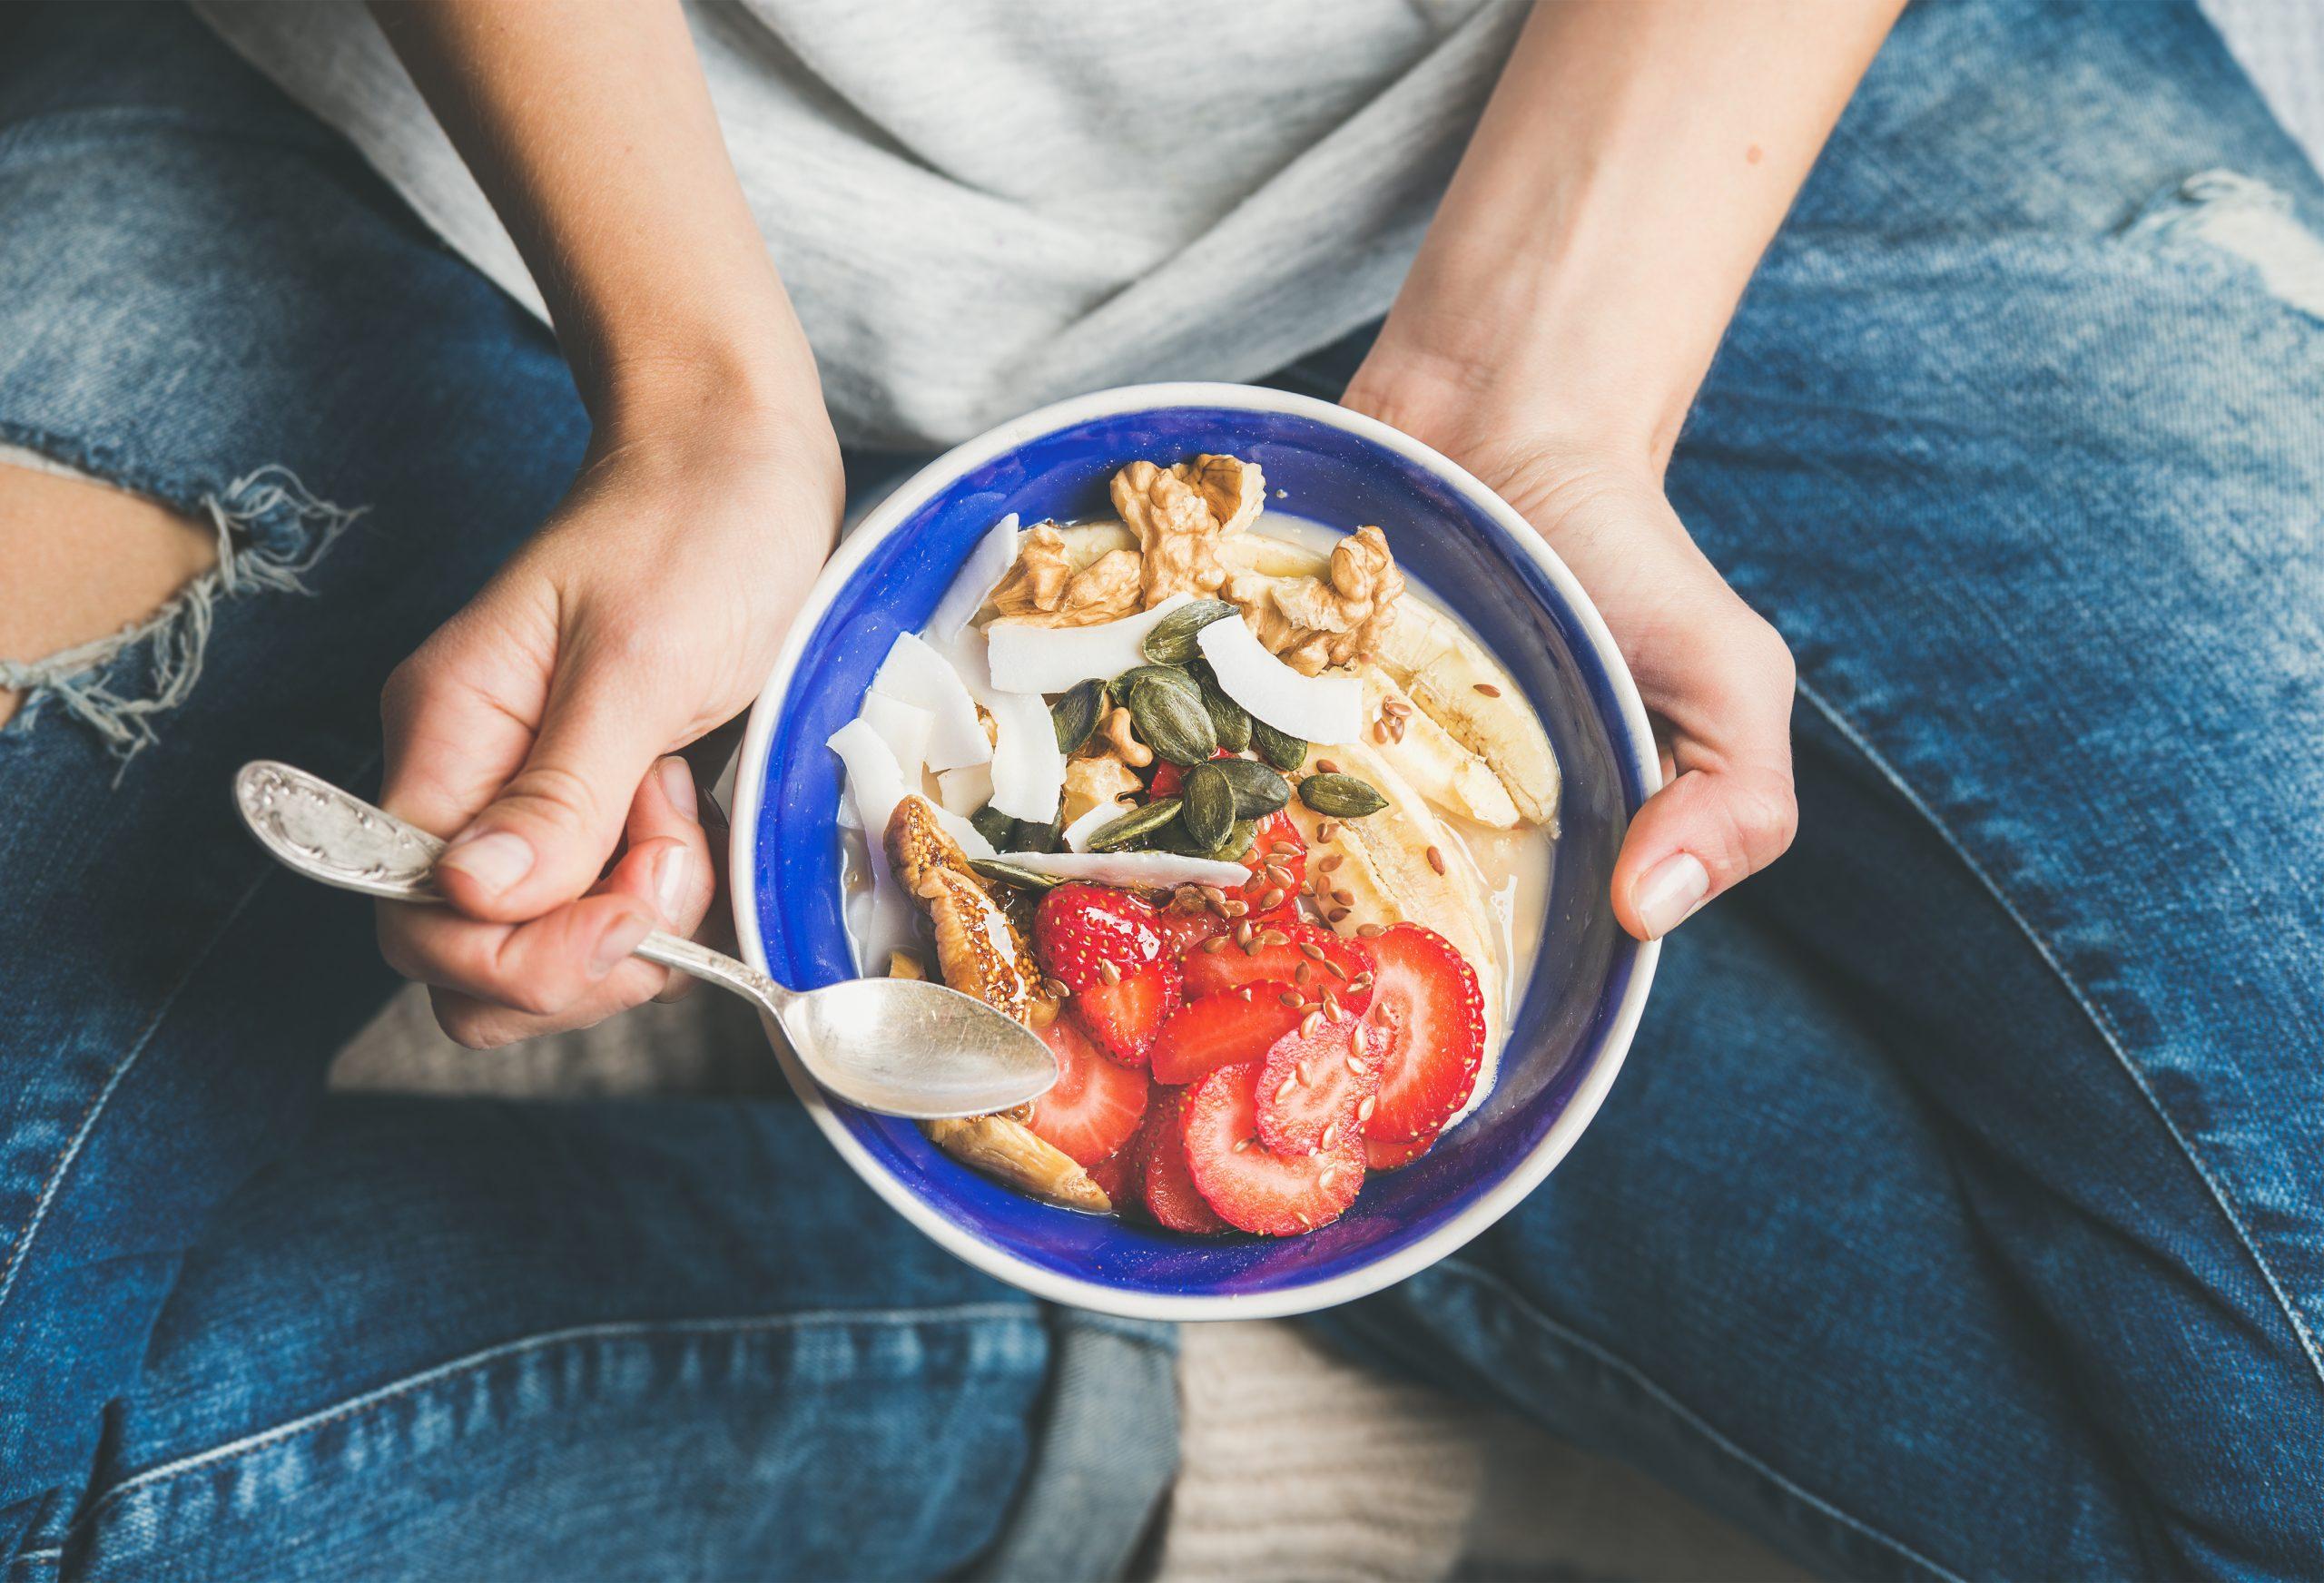 Preventative Healthcare Through Health Management Programming: Healthy Breakfast Bowl Featured